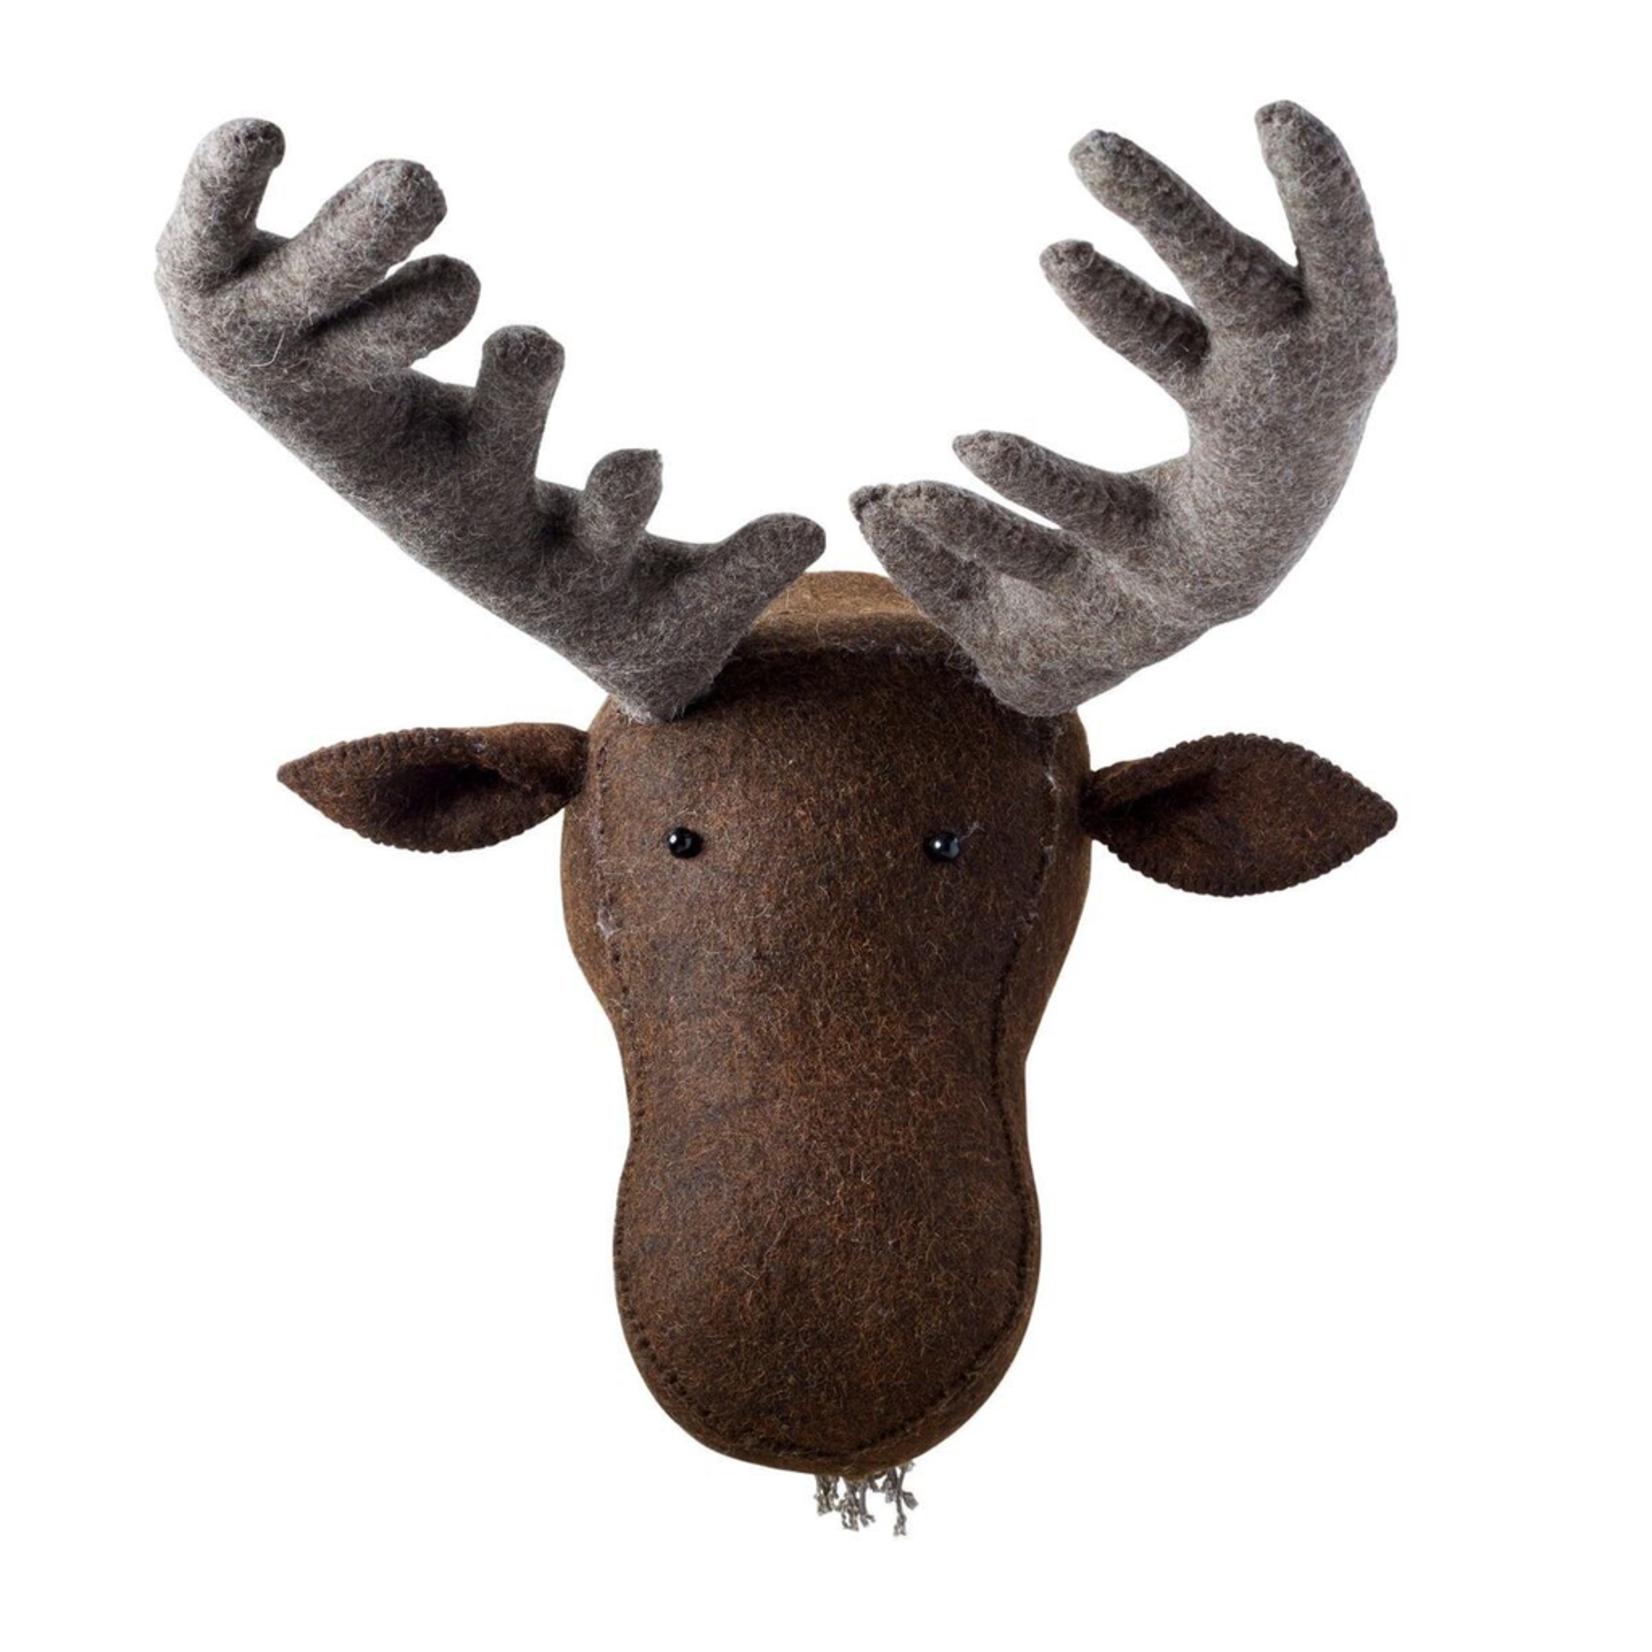 Fiona Walker Fiona Walker Brown Felt Moose Head Original Large Size